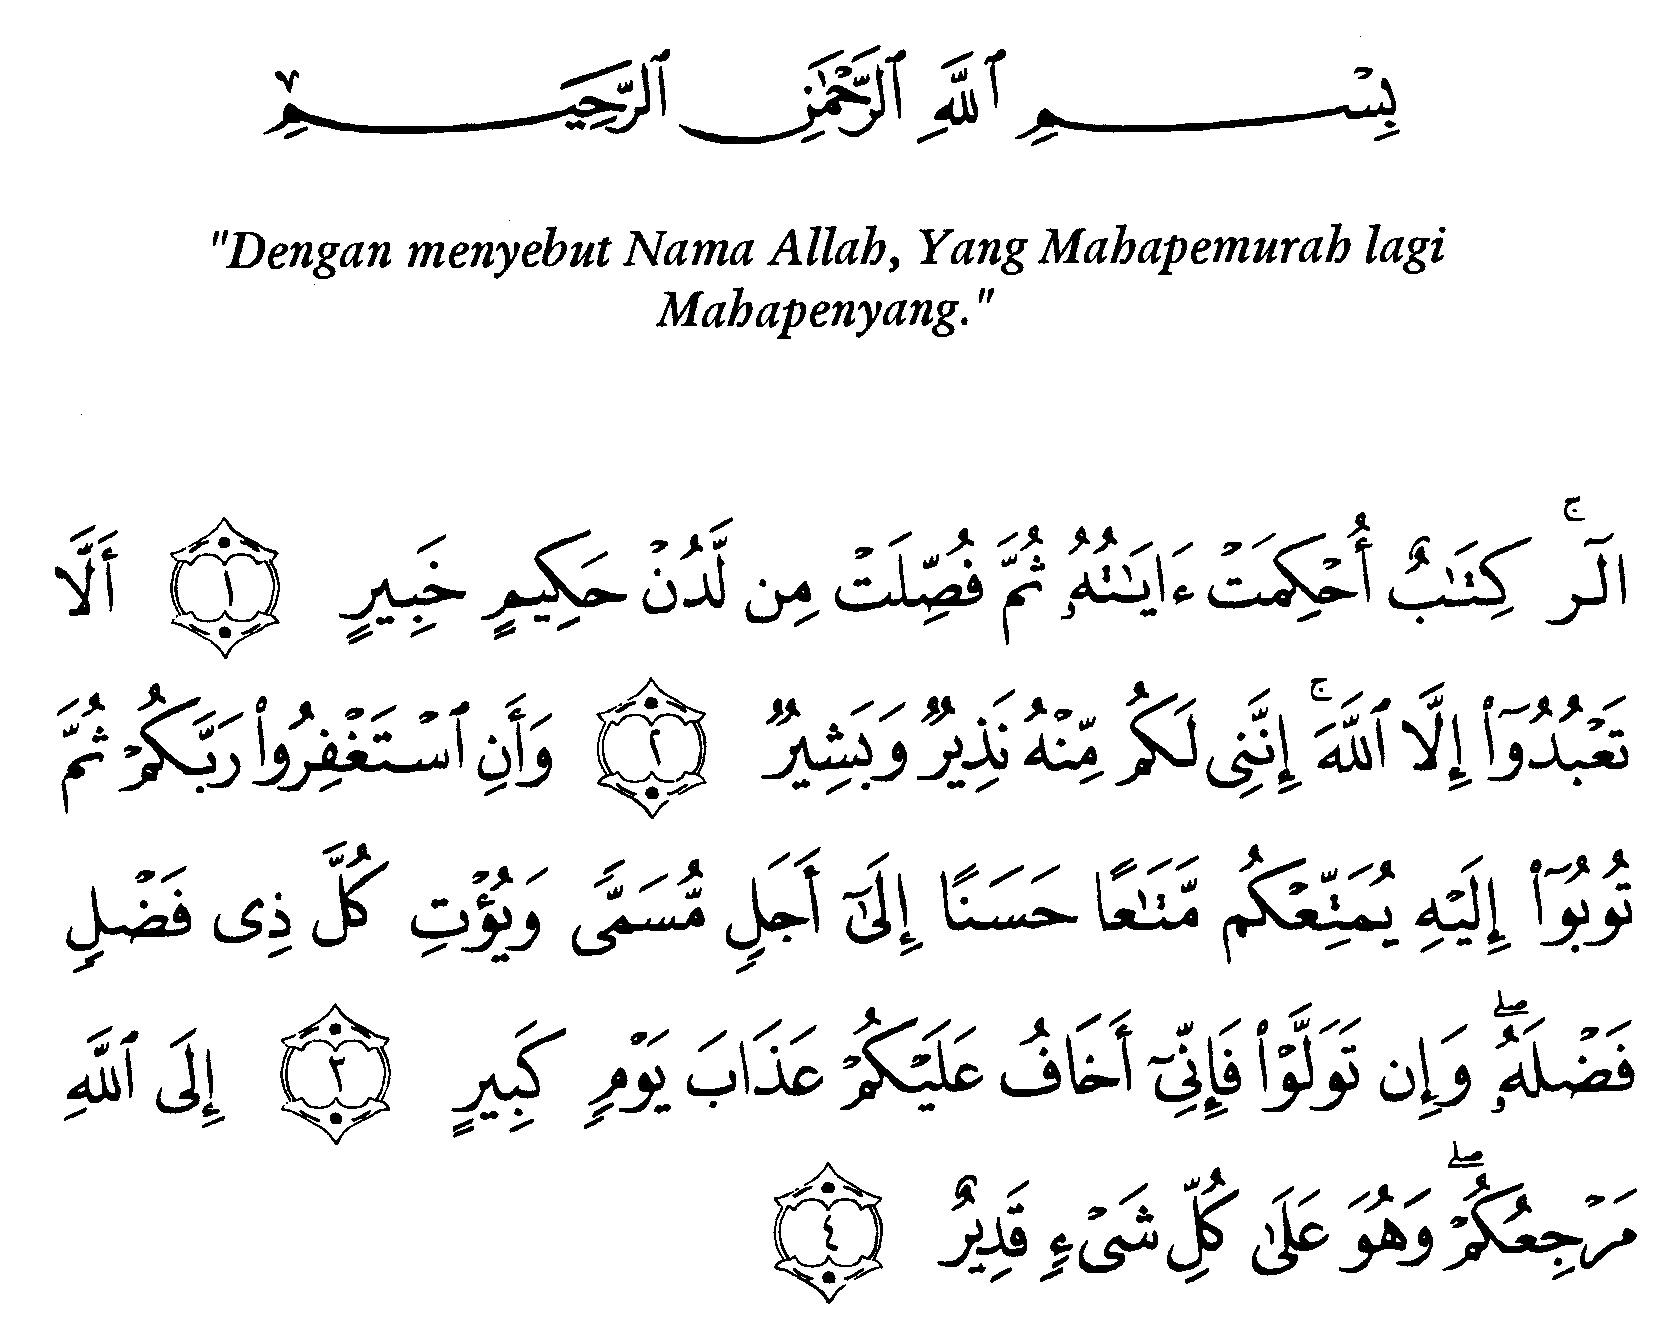 Tafsir Ibnu Katsir Surah Huud 1 Alquranmulia